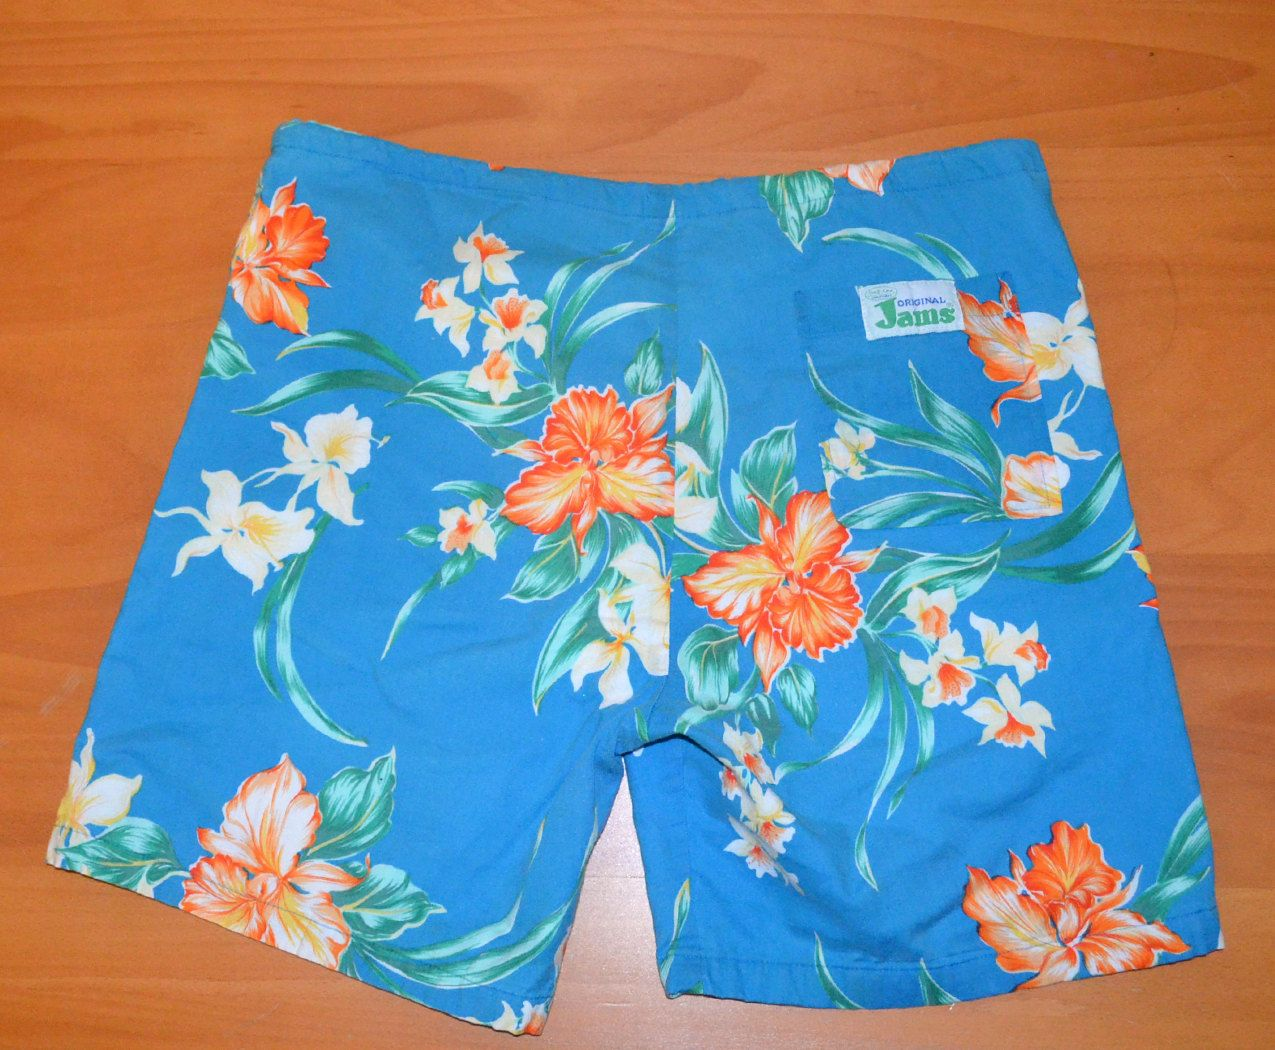 6b43358989d80 vintage 80s surf line original JAMS shorts floral by skippyhaha   A ...